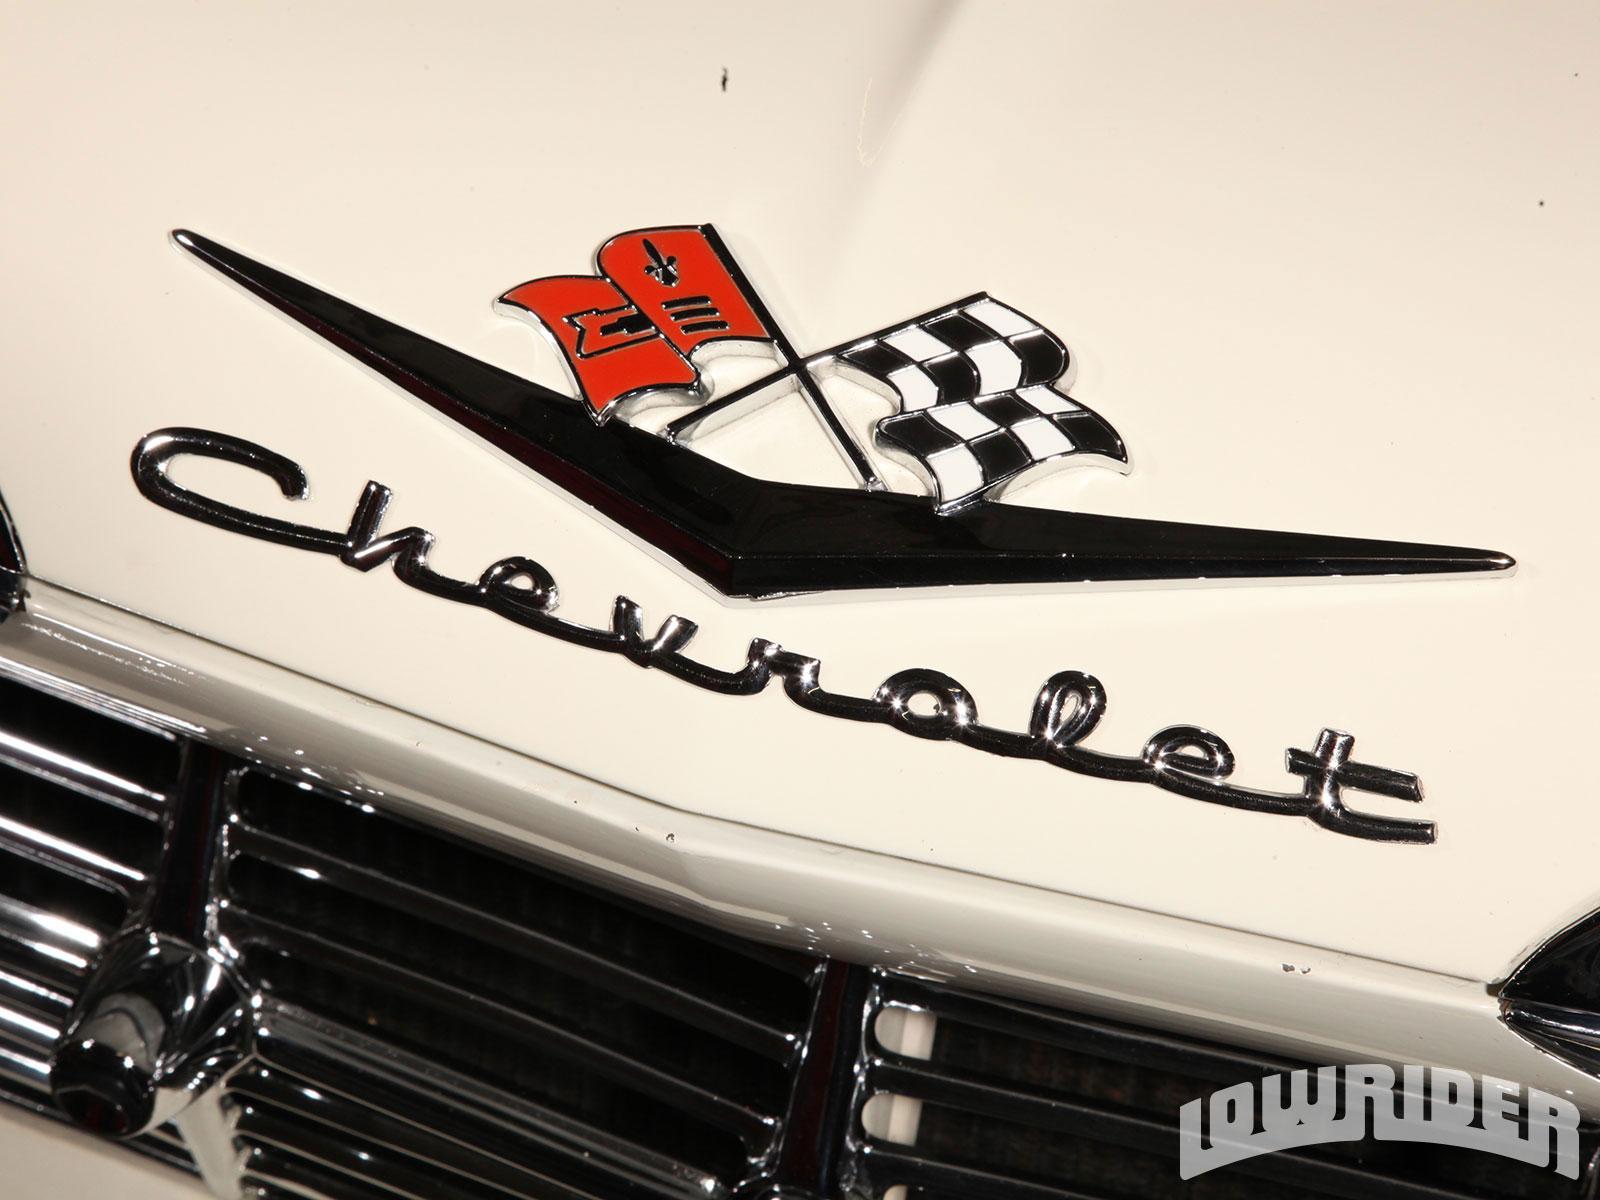 Lrmp O Chevy Impala Chevrolet Emblem on 1964 Buick Riviera Interior